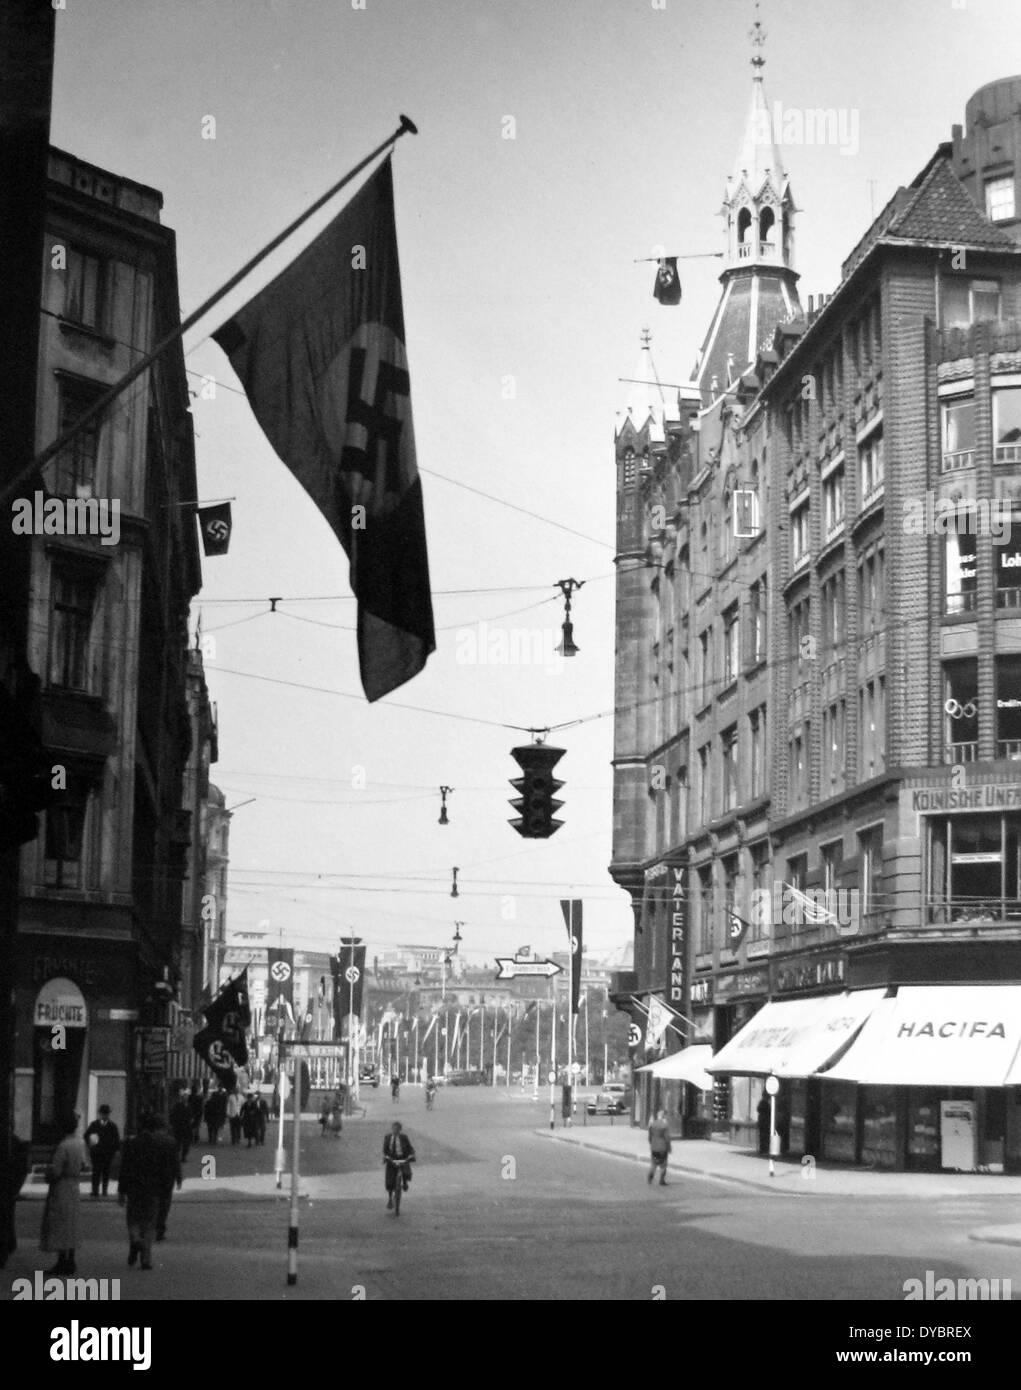 Hamburg Germany in the 1930s - Stock Image